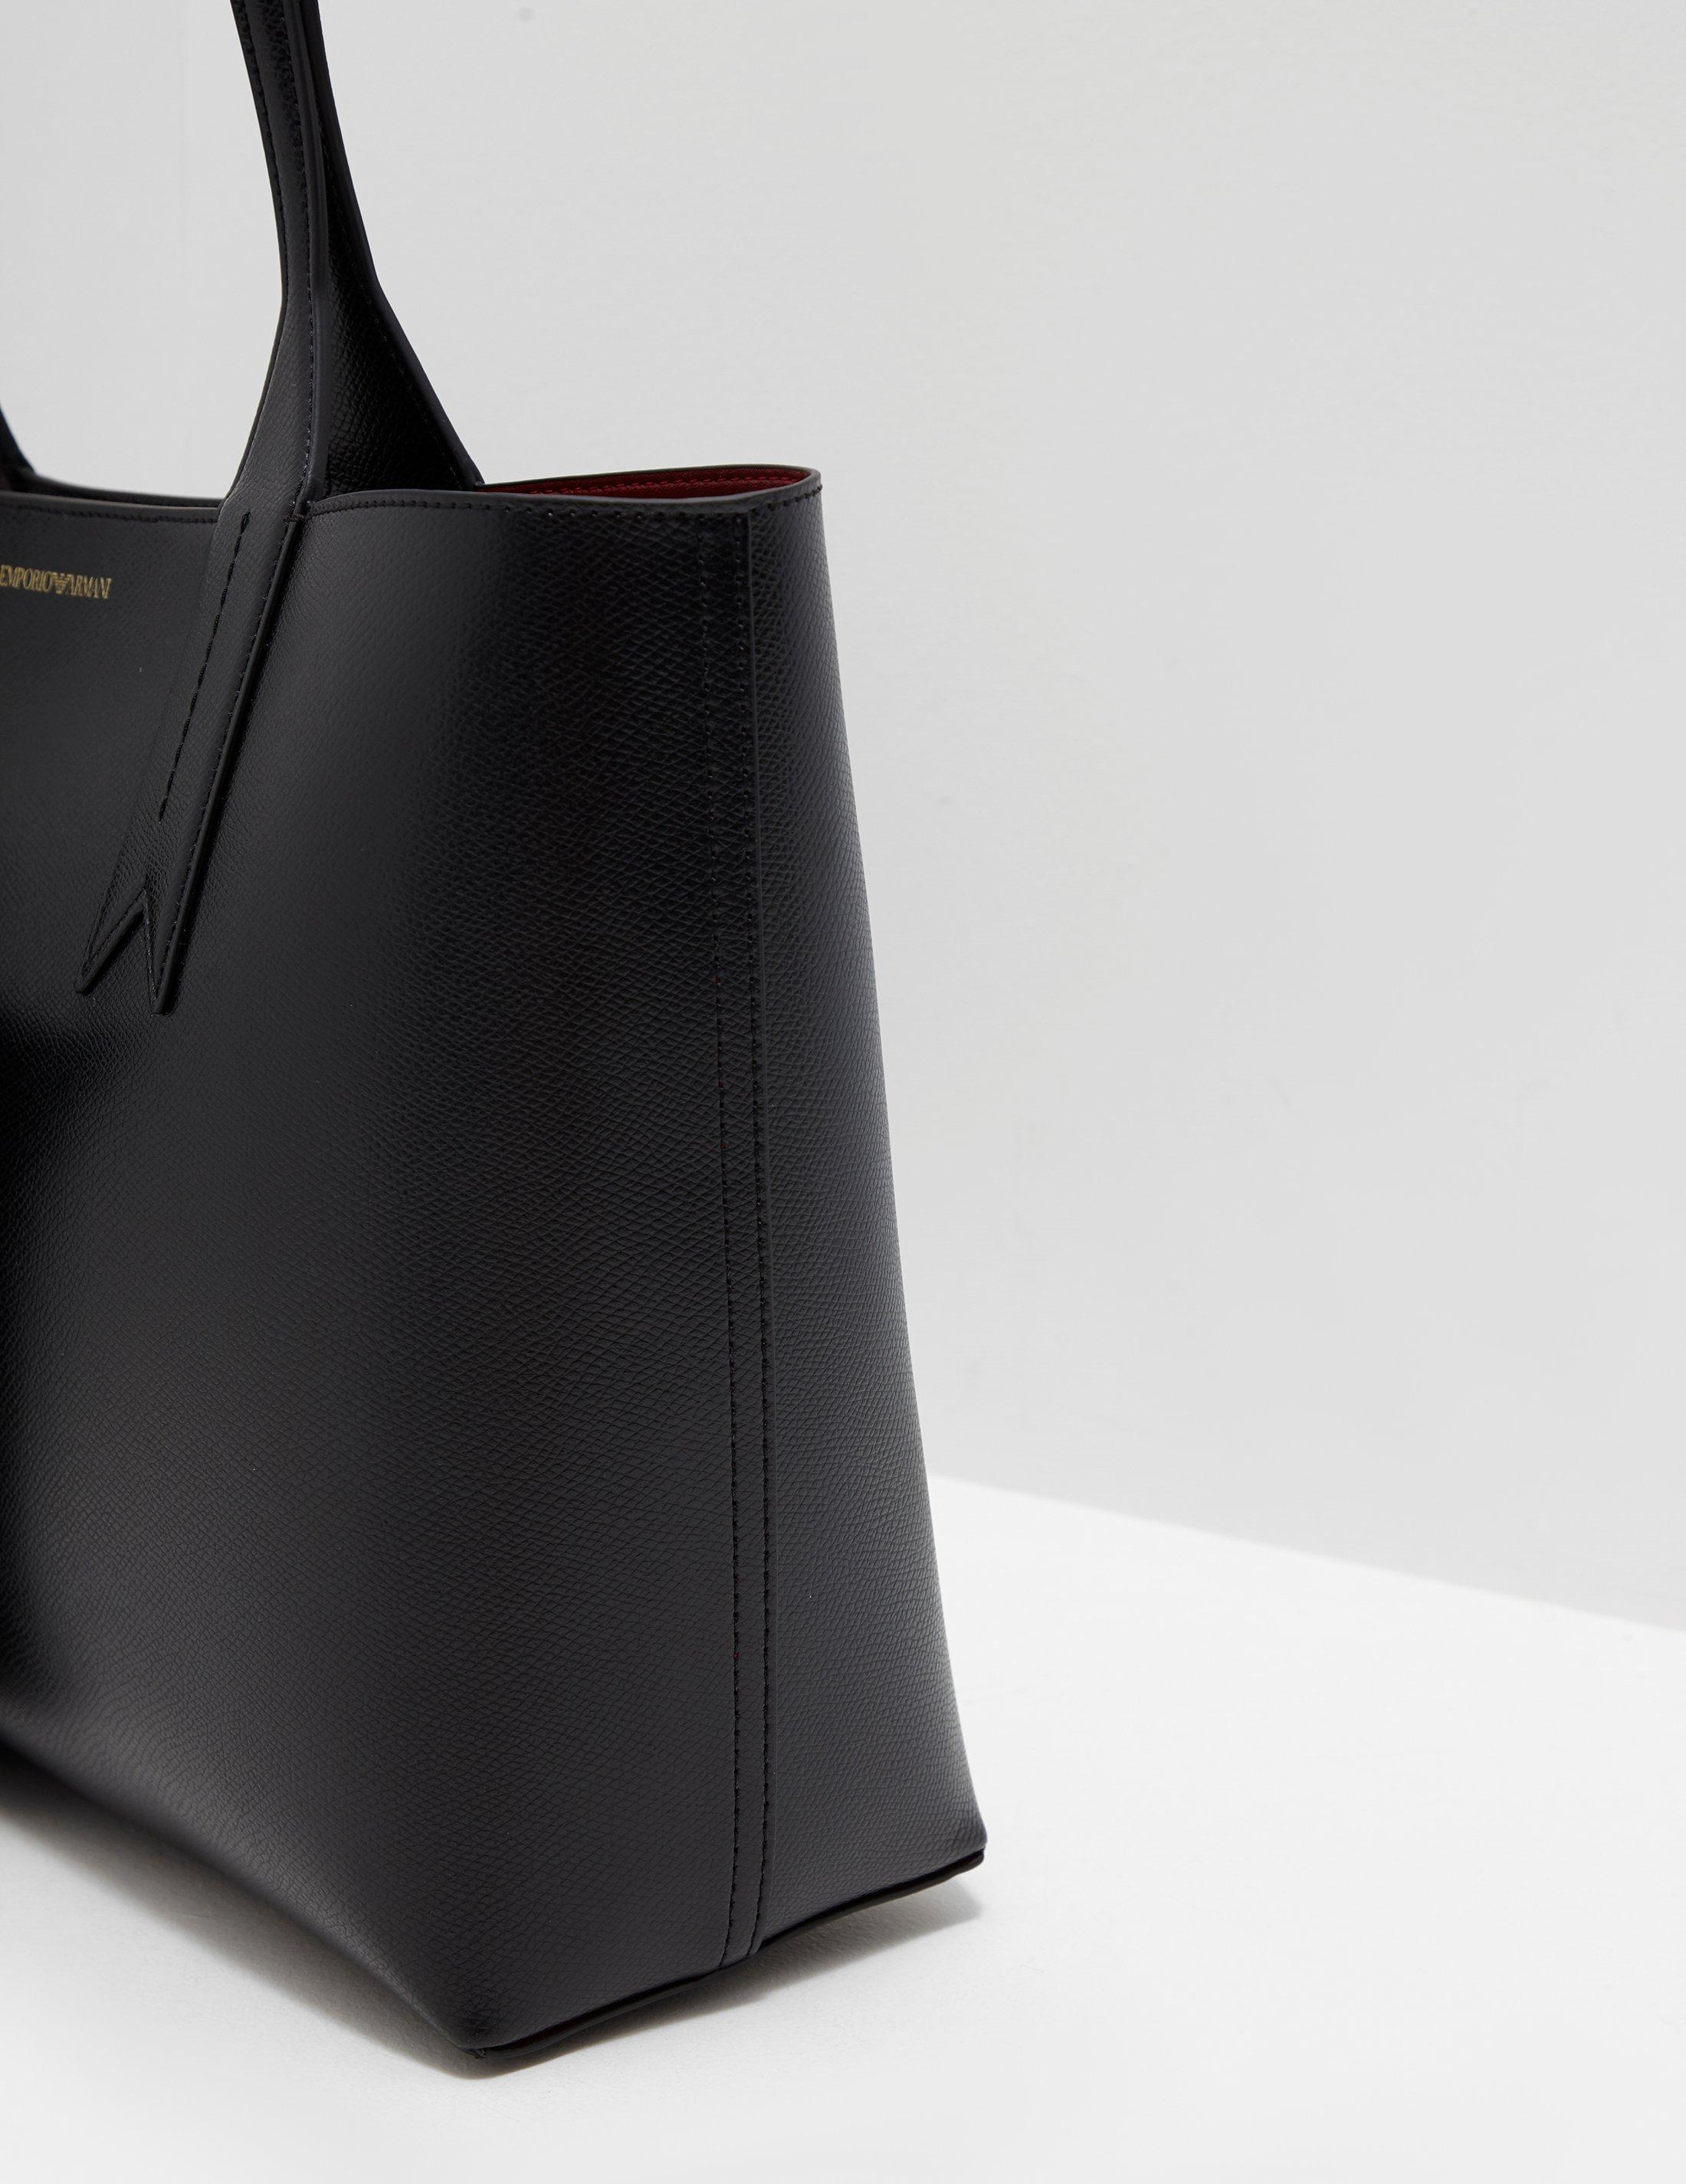 ae189309d ... Emporio Armani - Borsa Large Shopper Bag Black - Lyst. Visit Tessuti  UK. Tap to visit site